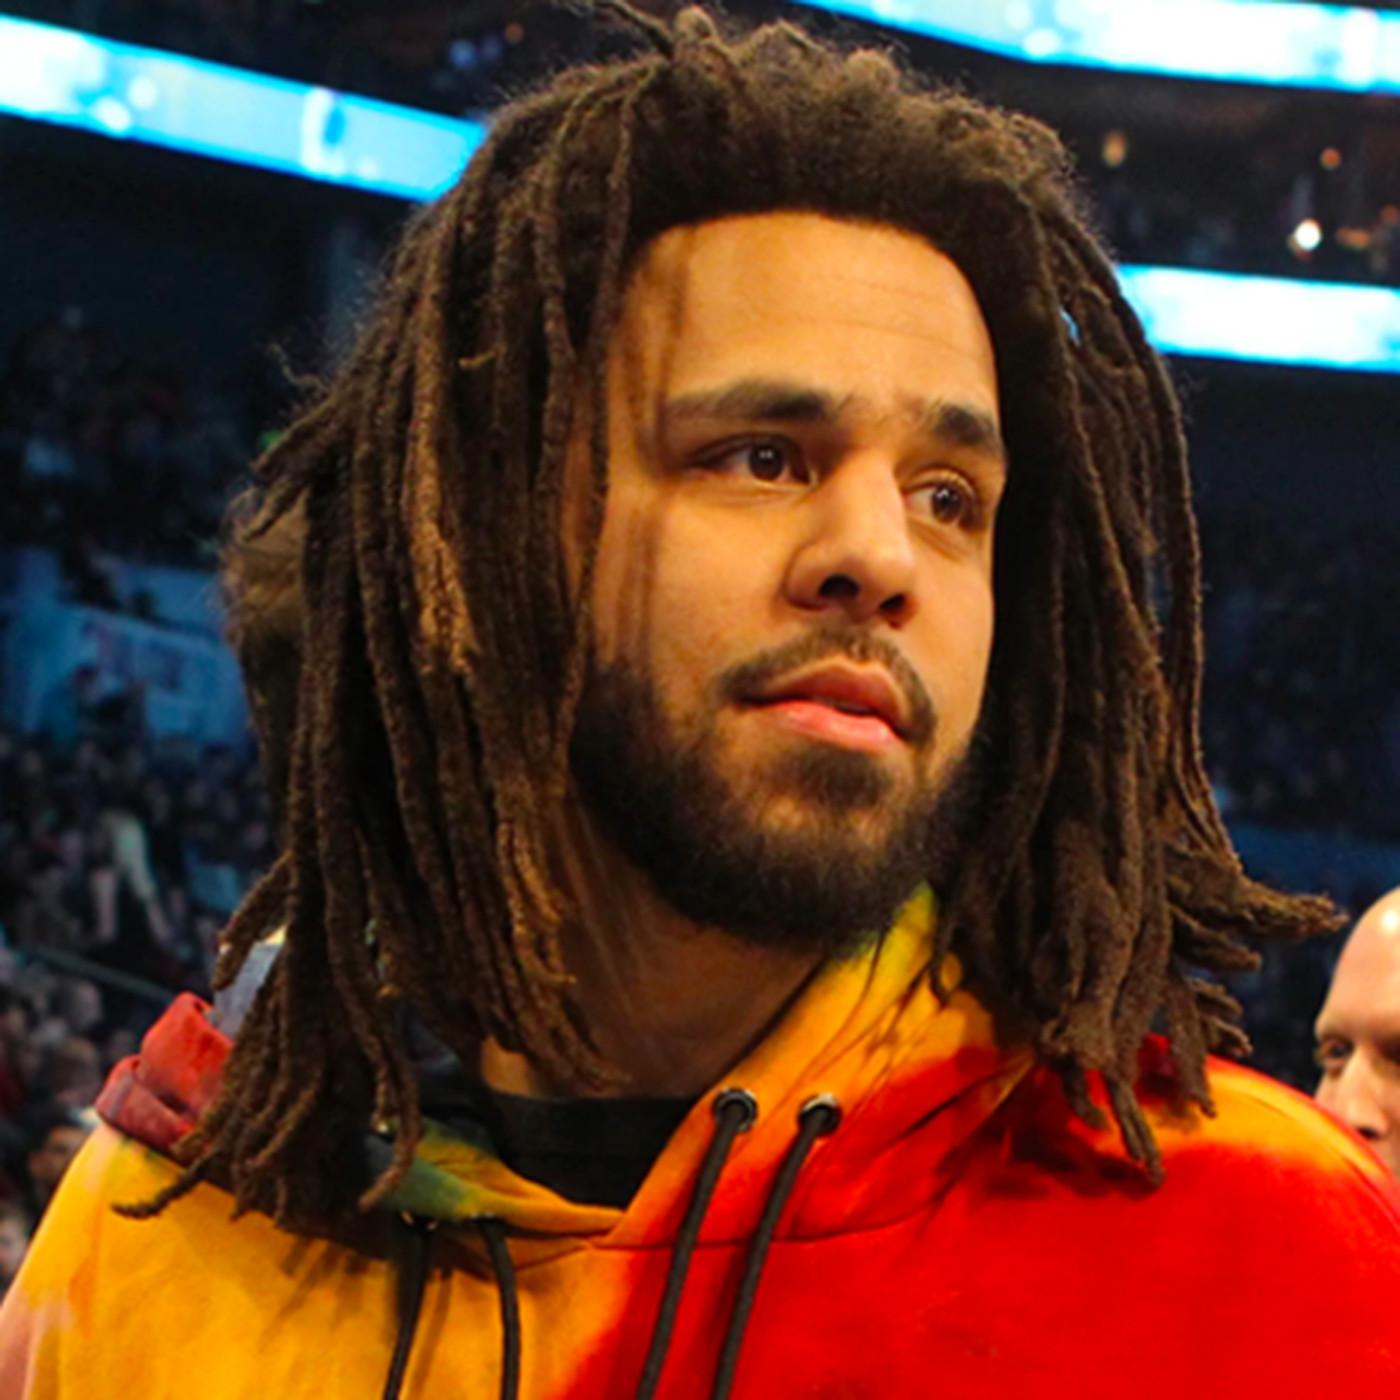 J Cole Joins Protesters In North Carolina Revolt